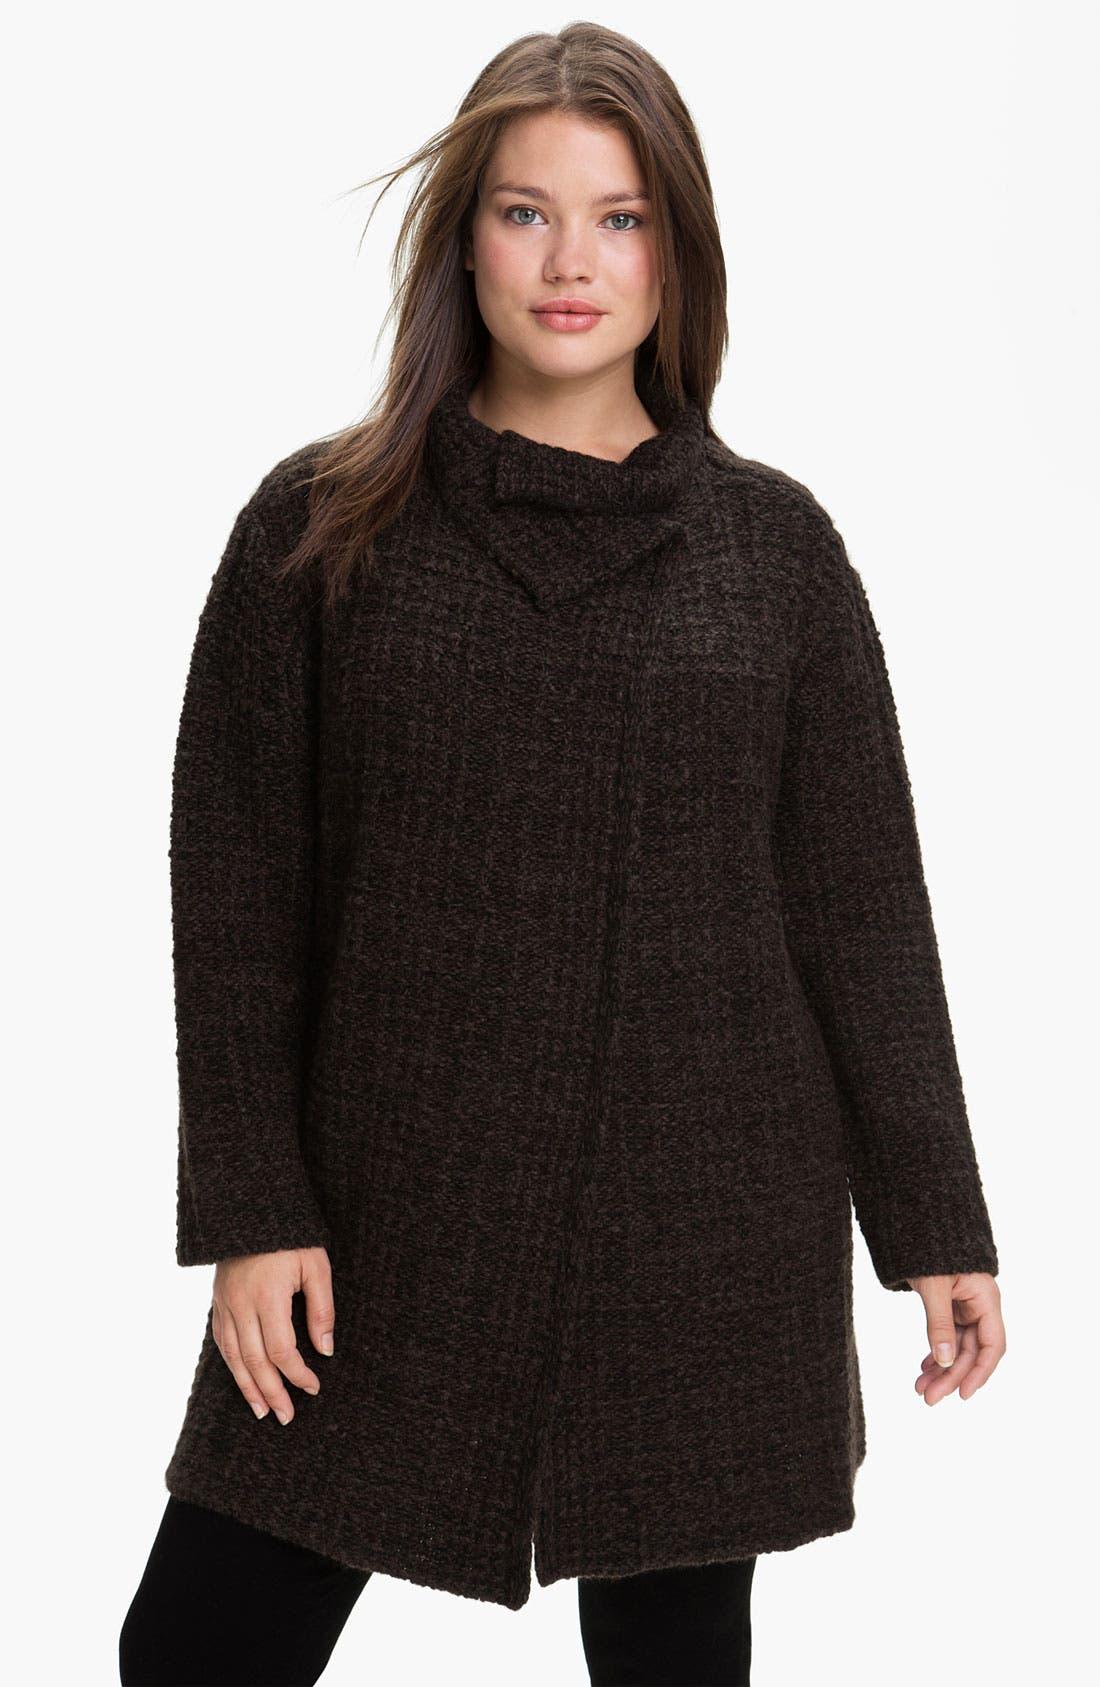 Alternate Image 1 Selected - Eileen Fisher 'Eco Pebble Plaid' Jacket (Plus)